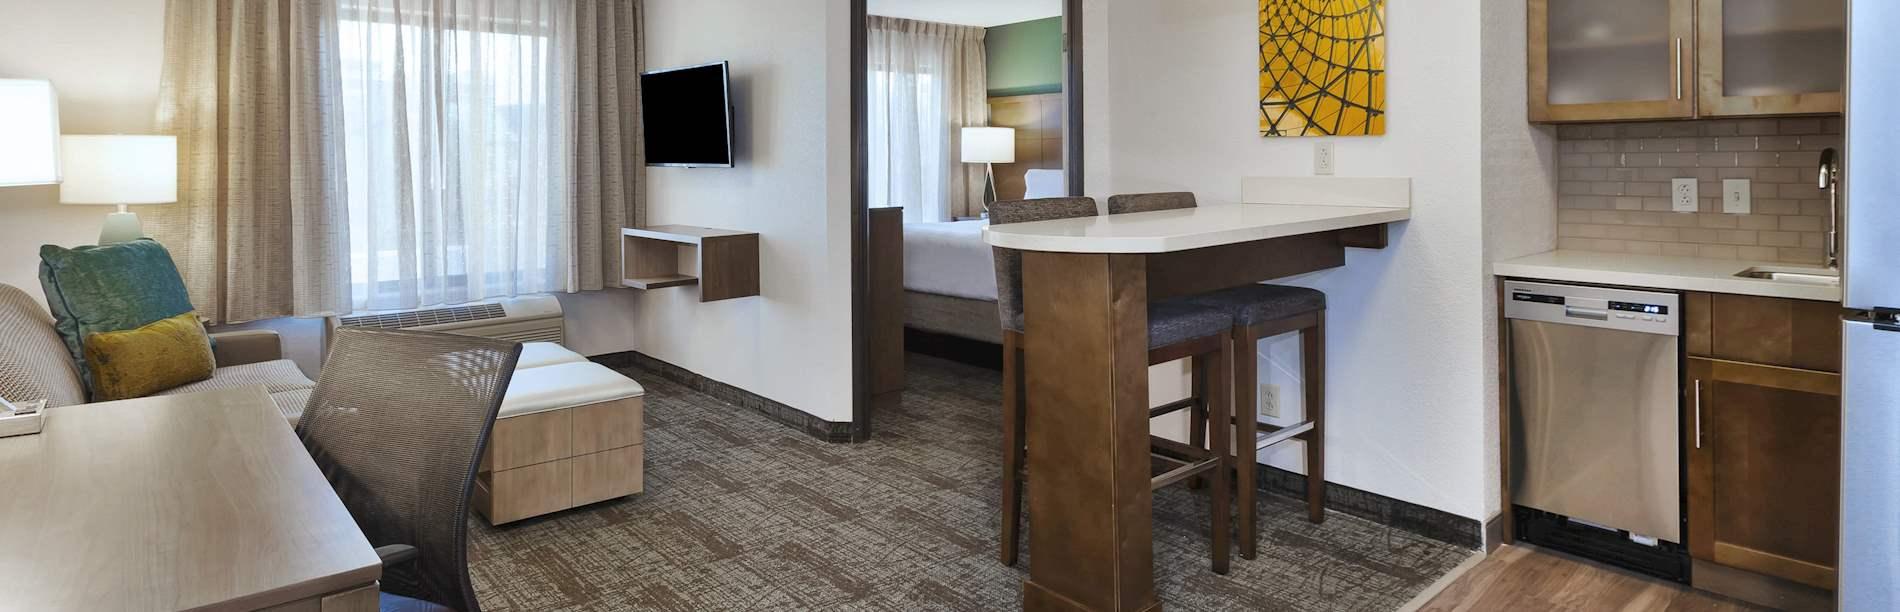 Staybridge Suites Columbia Hotel, Missouri